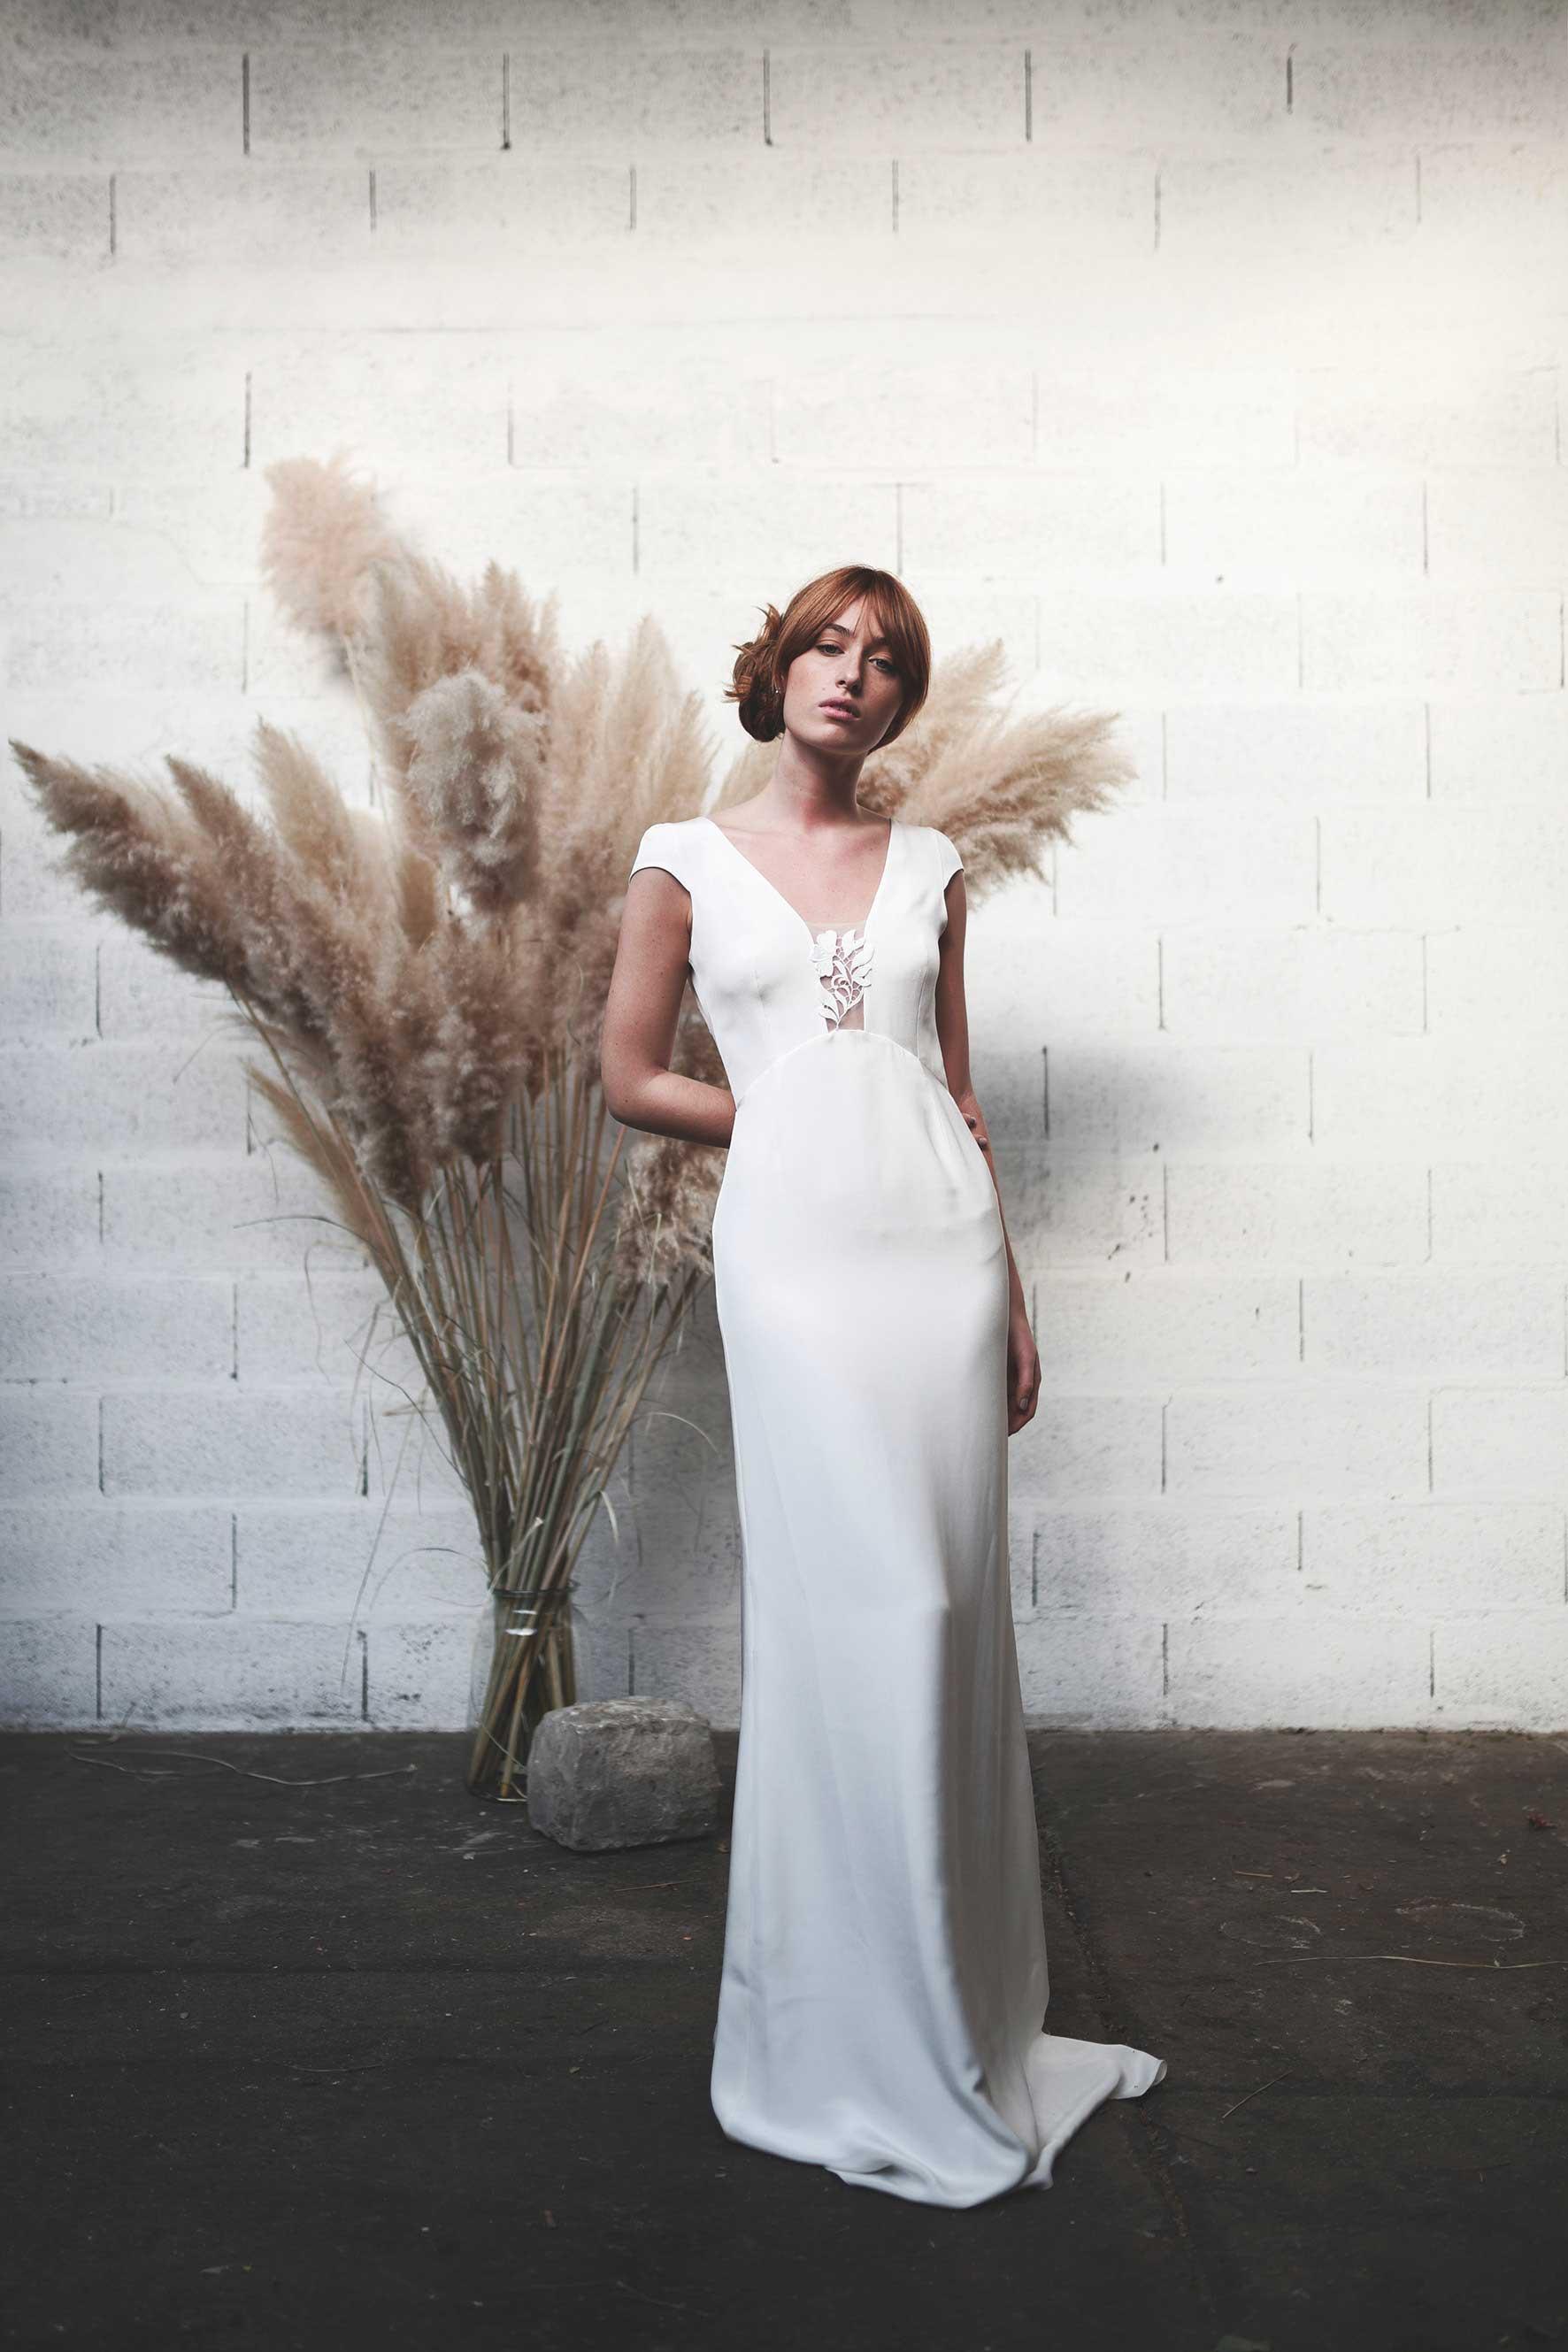 Stéphanie Wolff - Wonderwall - Robe de mariée épurée